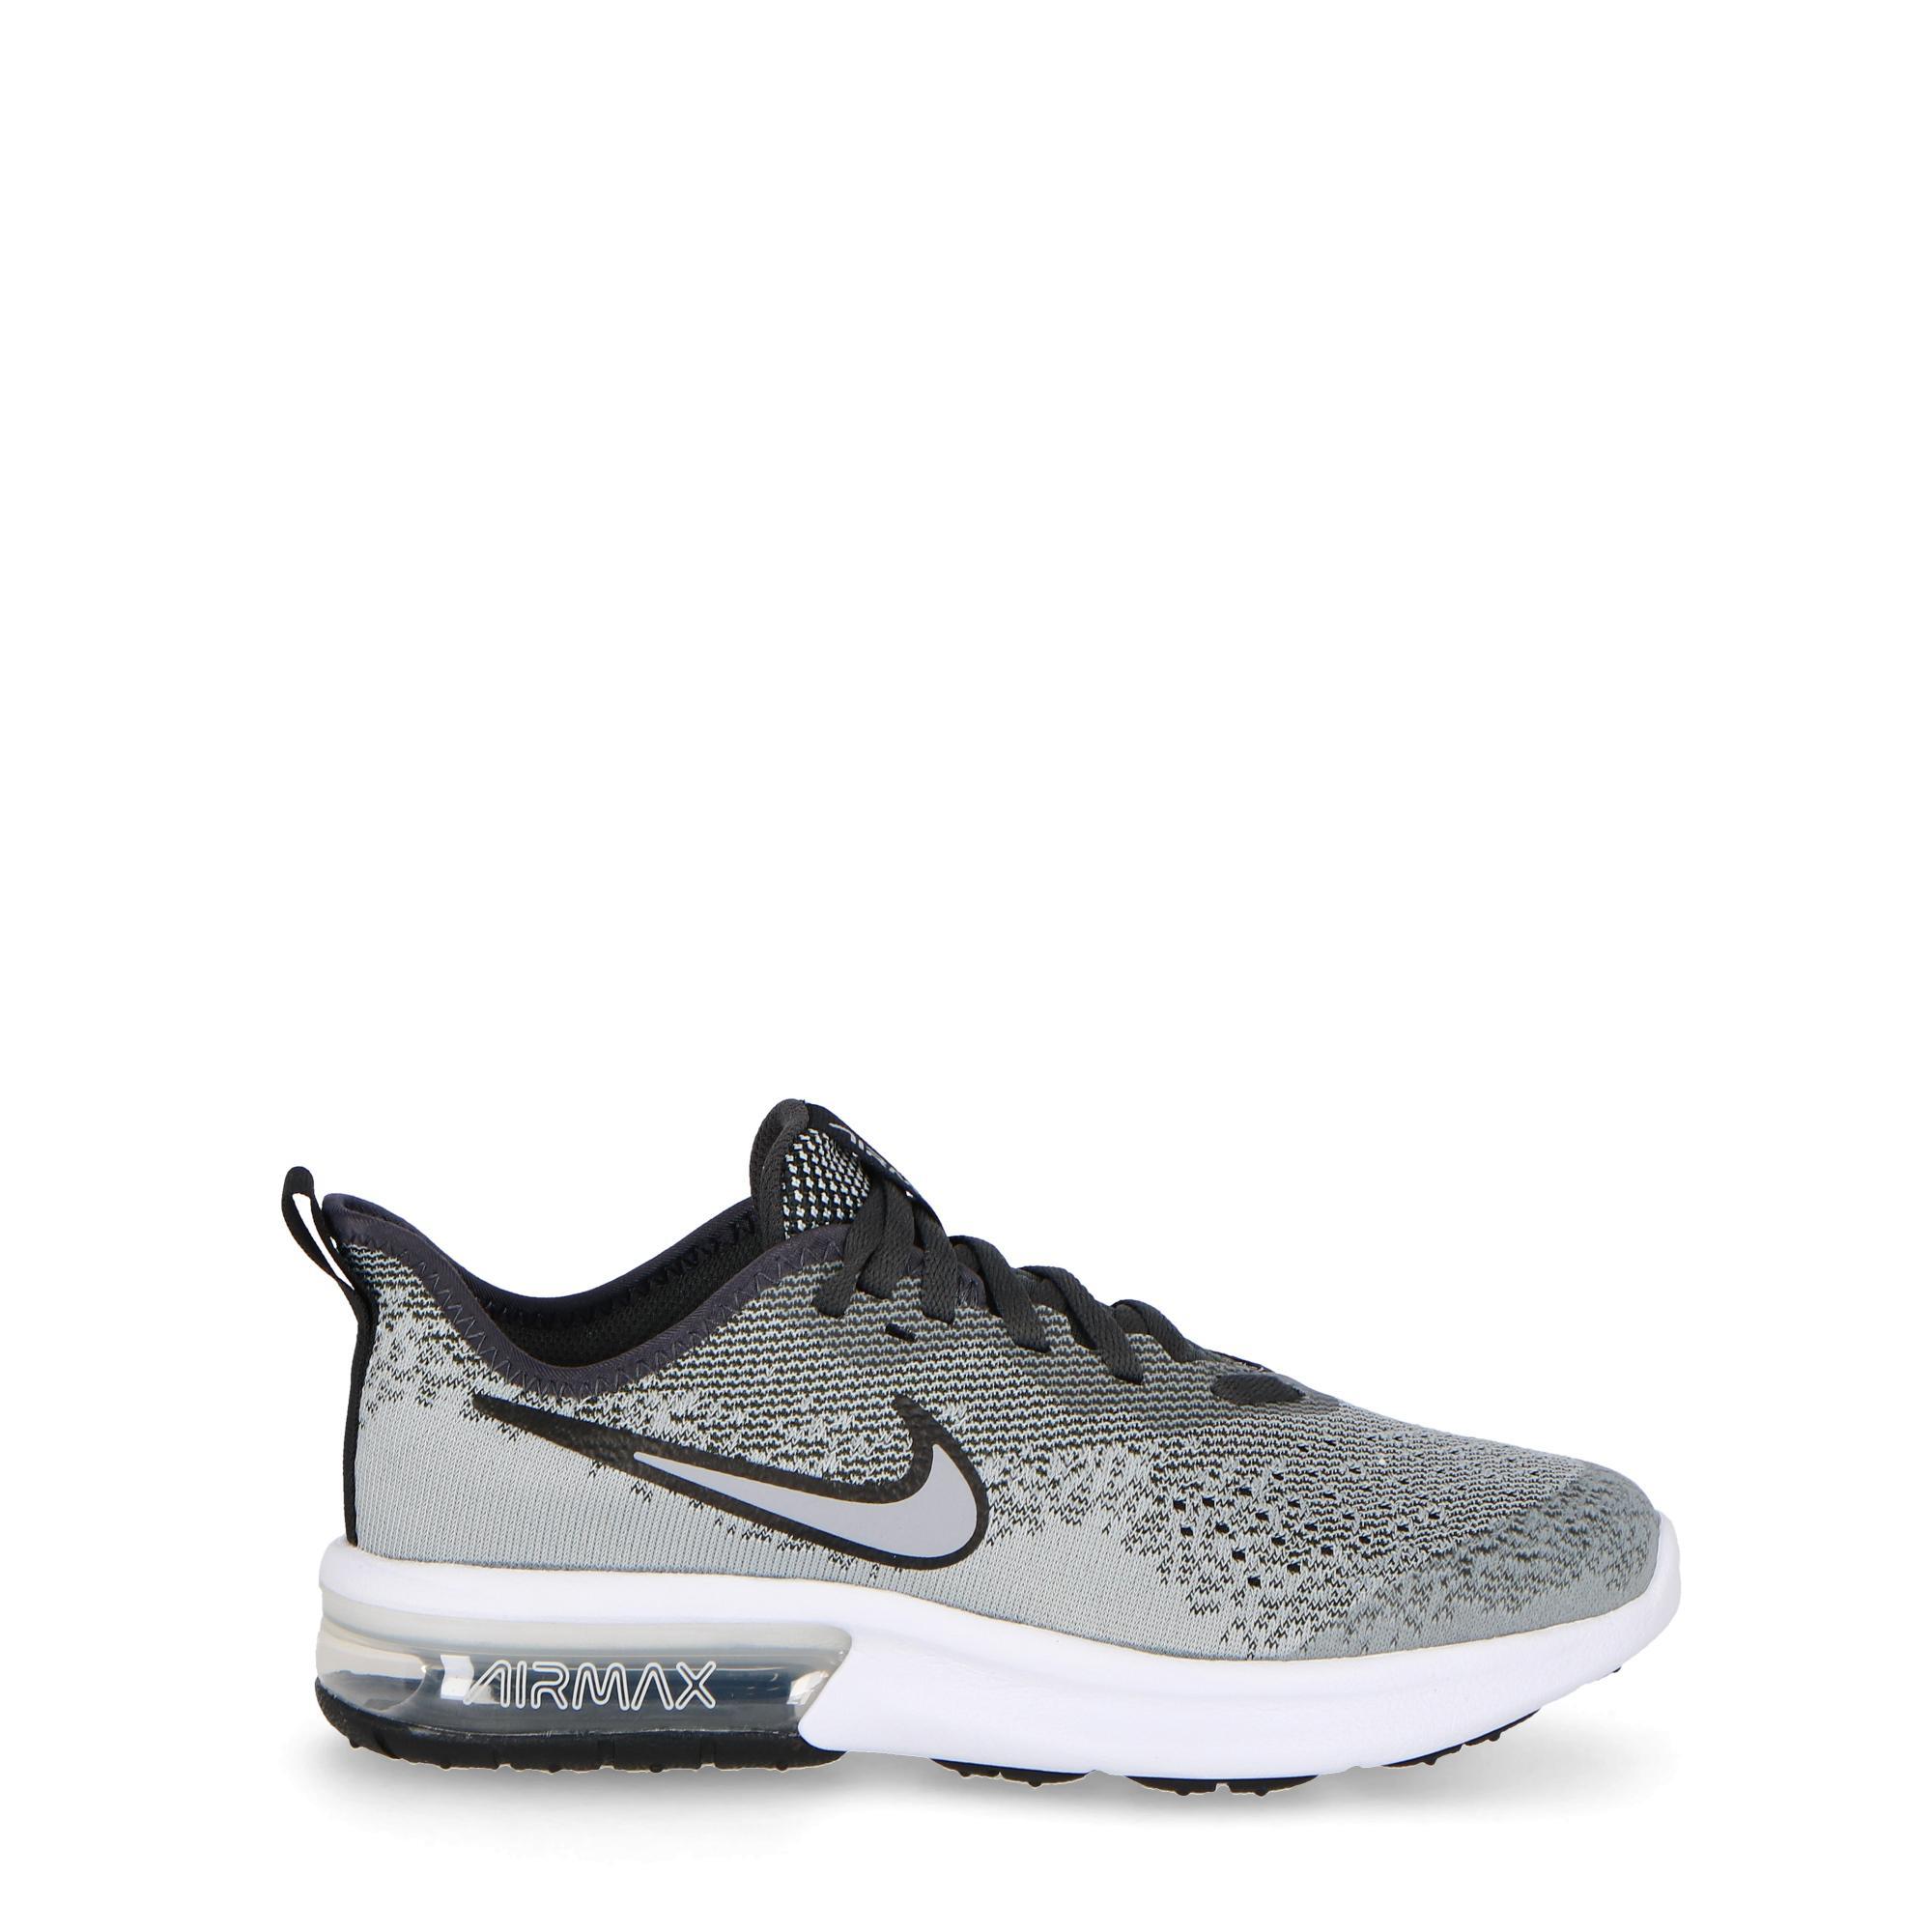 reputable site 57b5b ffc6e Nike Air Max Sequent 4 (gs) - Kids Wolf grey